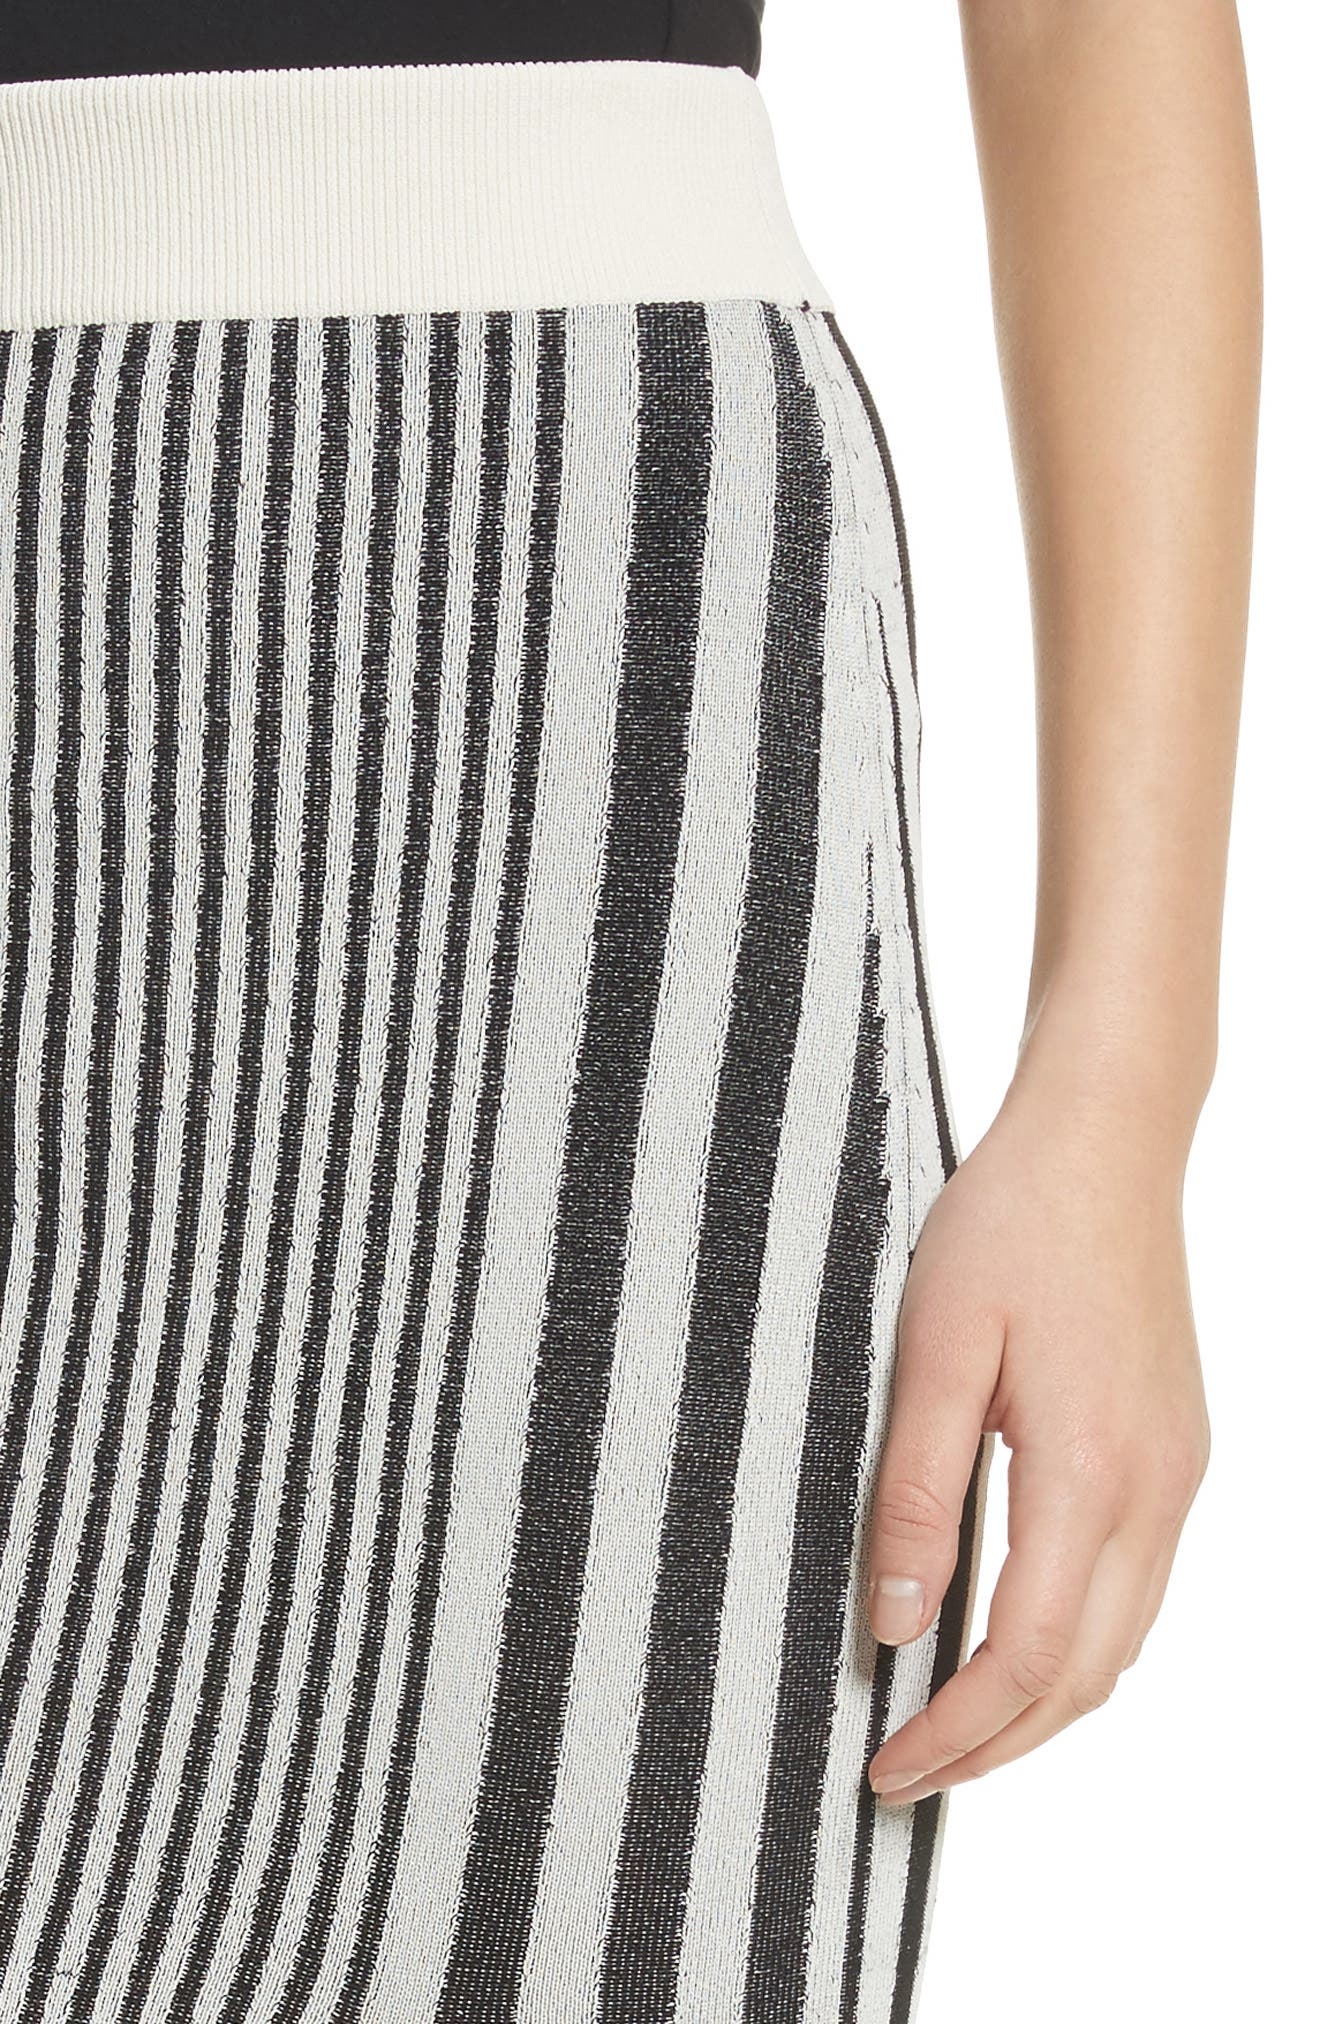 Tassel Trim Stripe Pencil Skirt,                             Alternate thumbnail 4, color,                             001